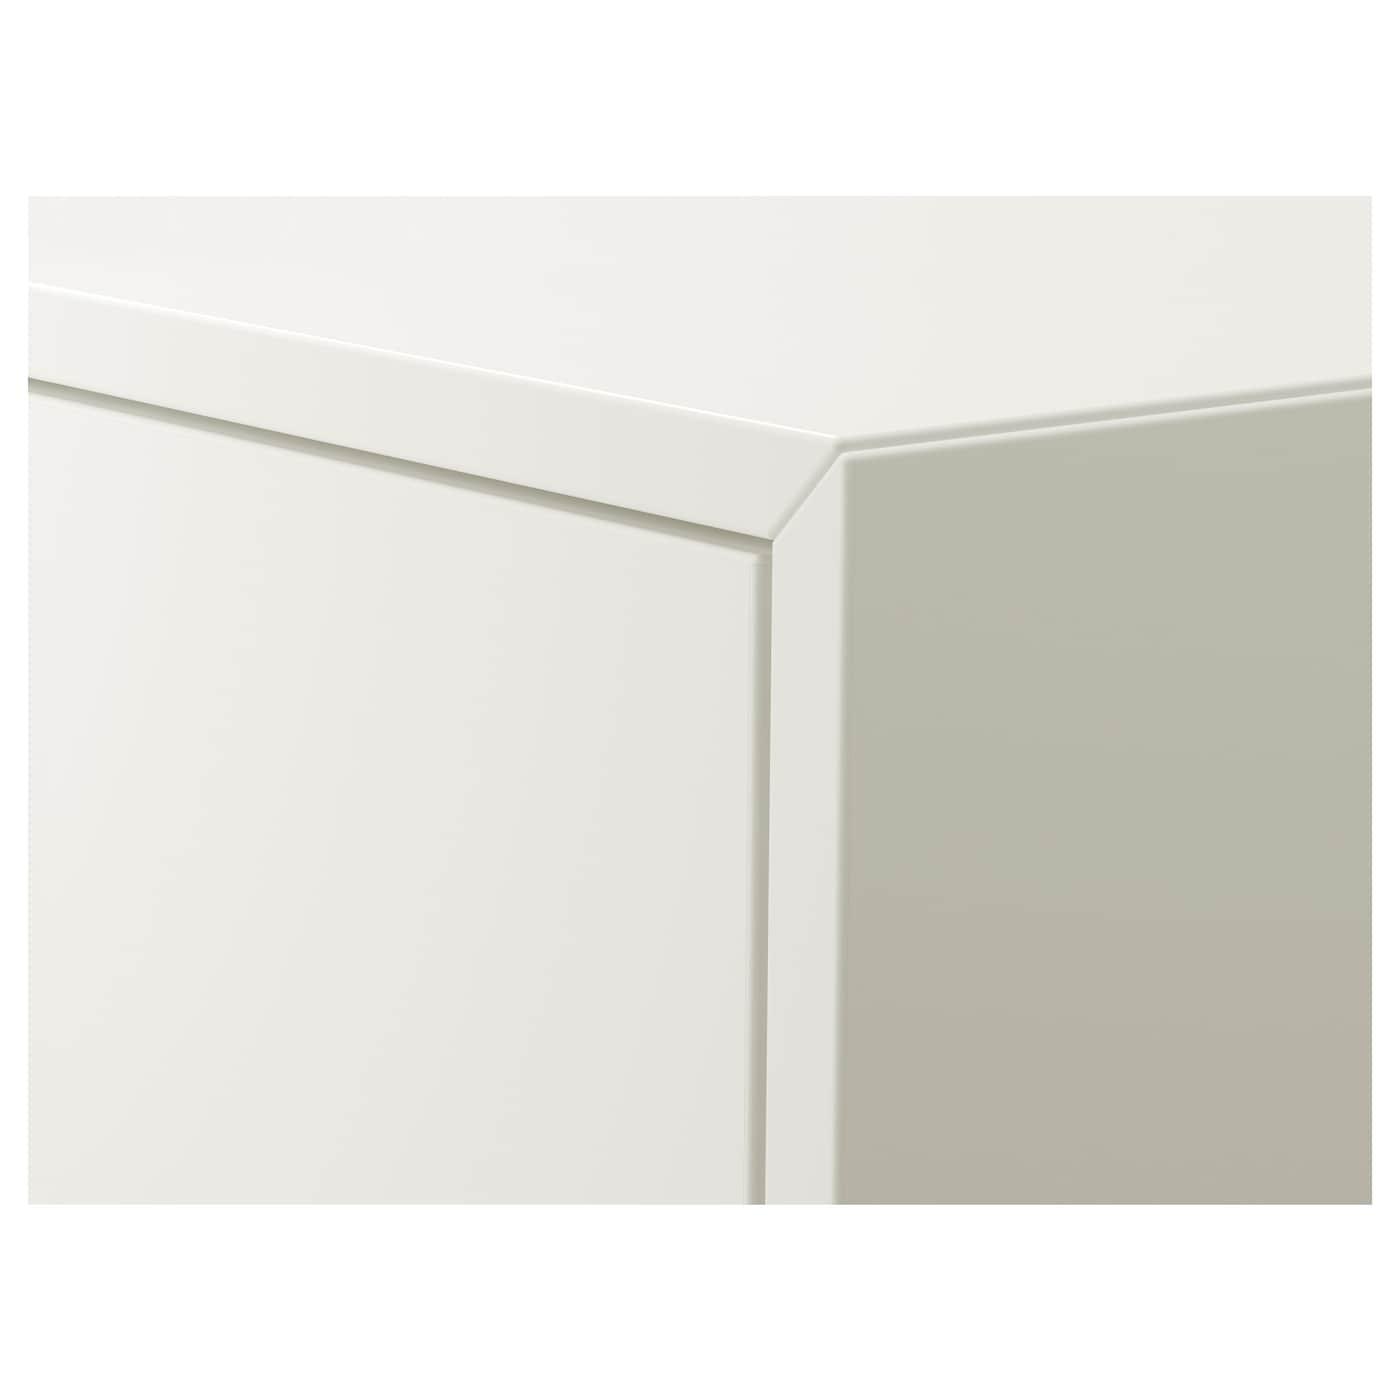 EKET Schrankkombination für Wandmontage weiß/hellgrau/dunkelgrau 105 cm 35 cm 120 cm